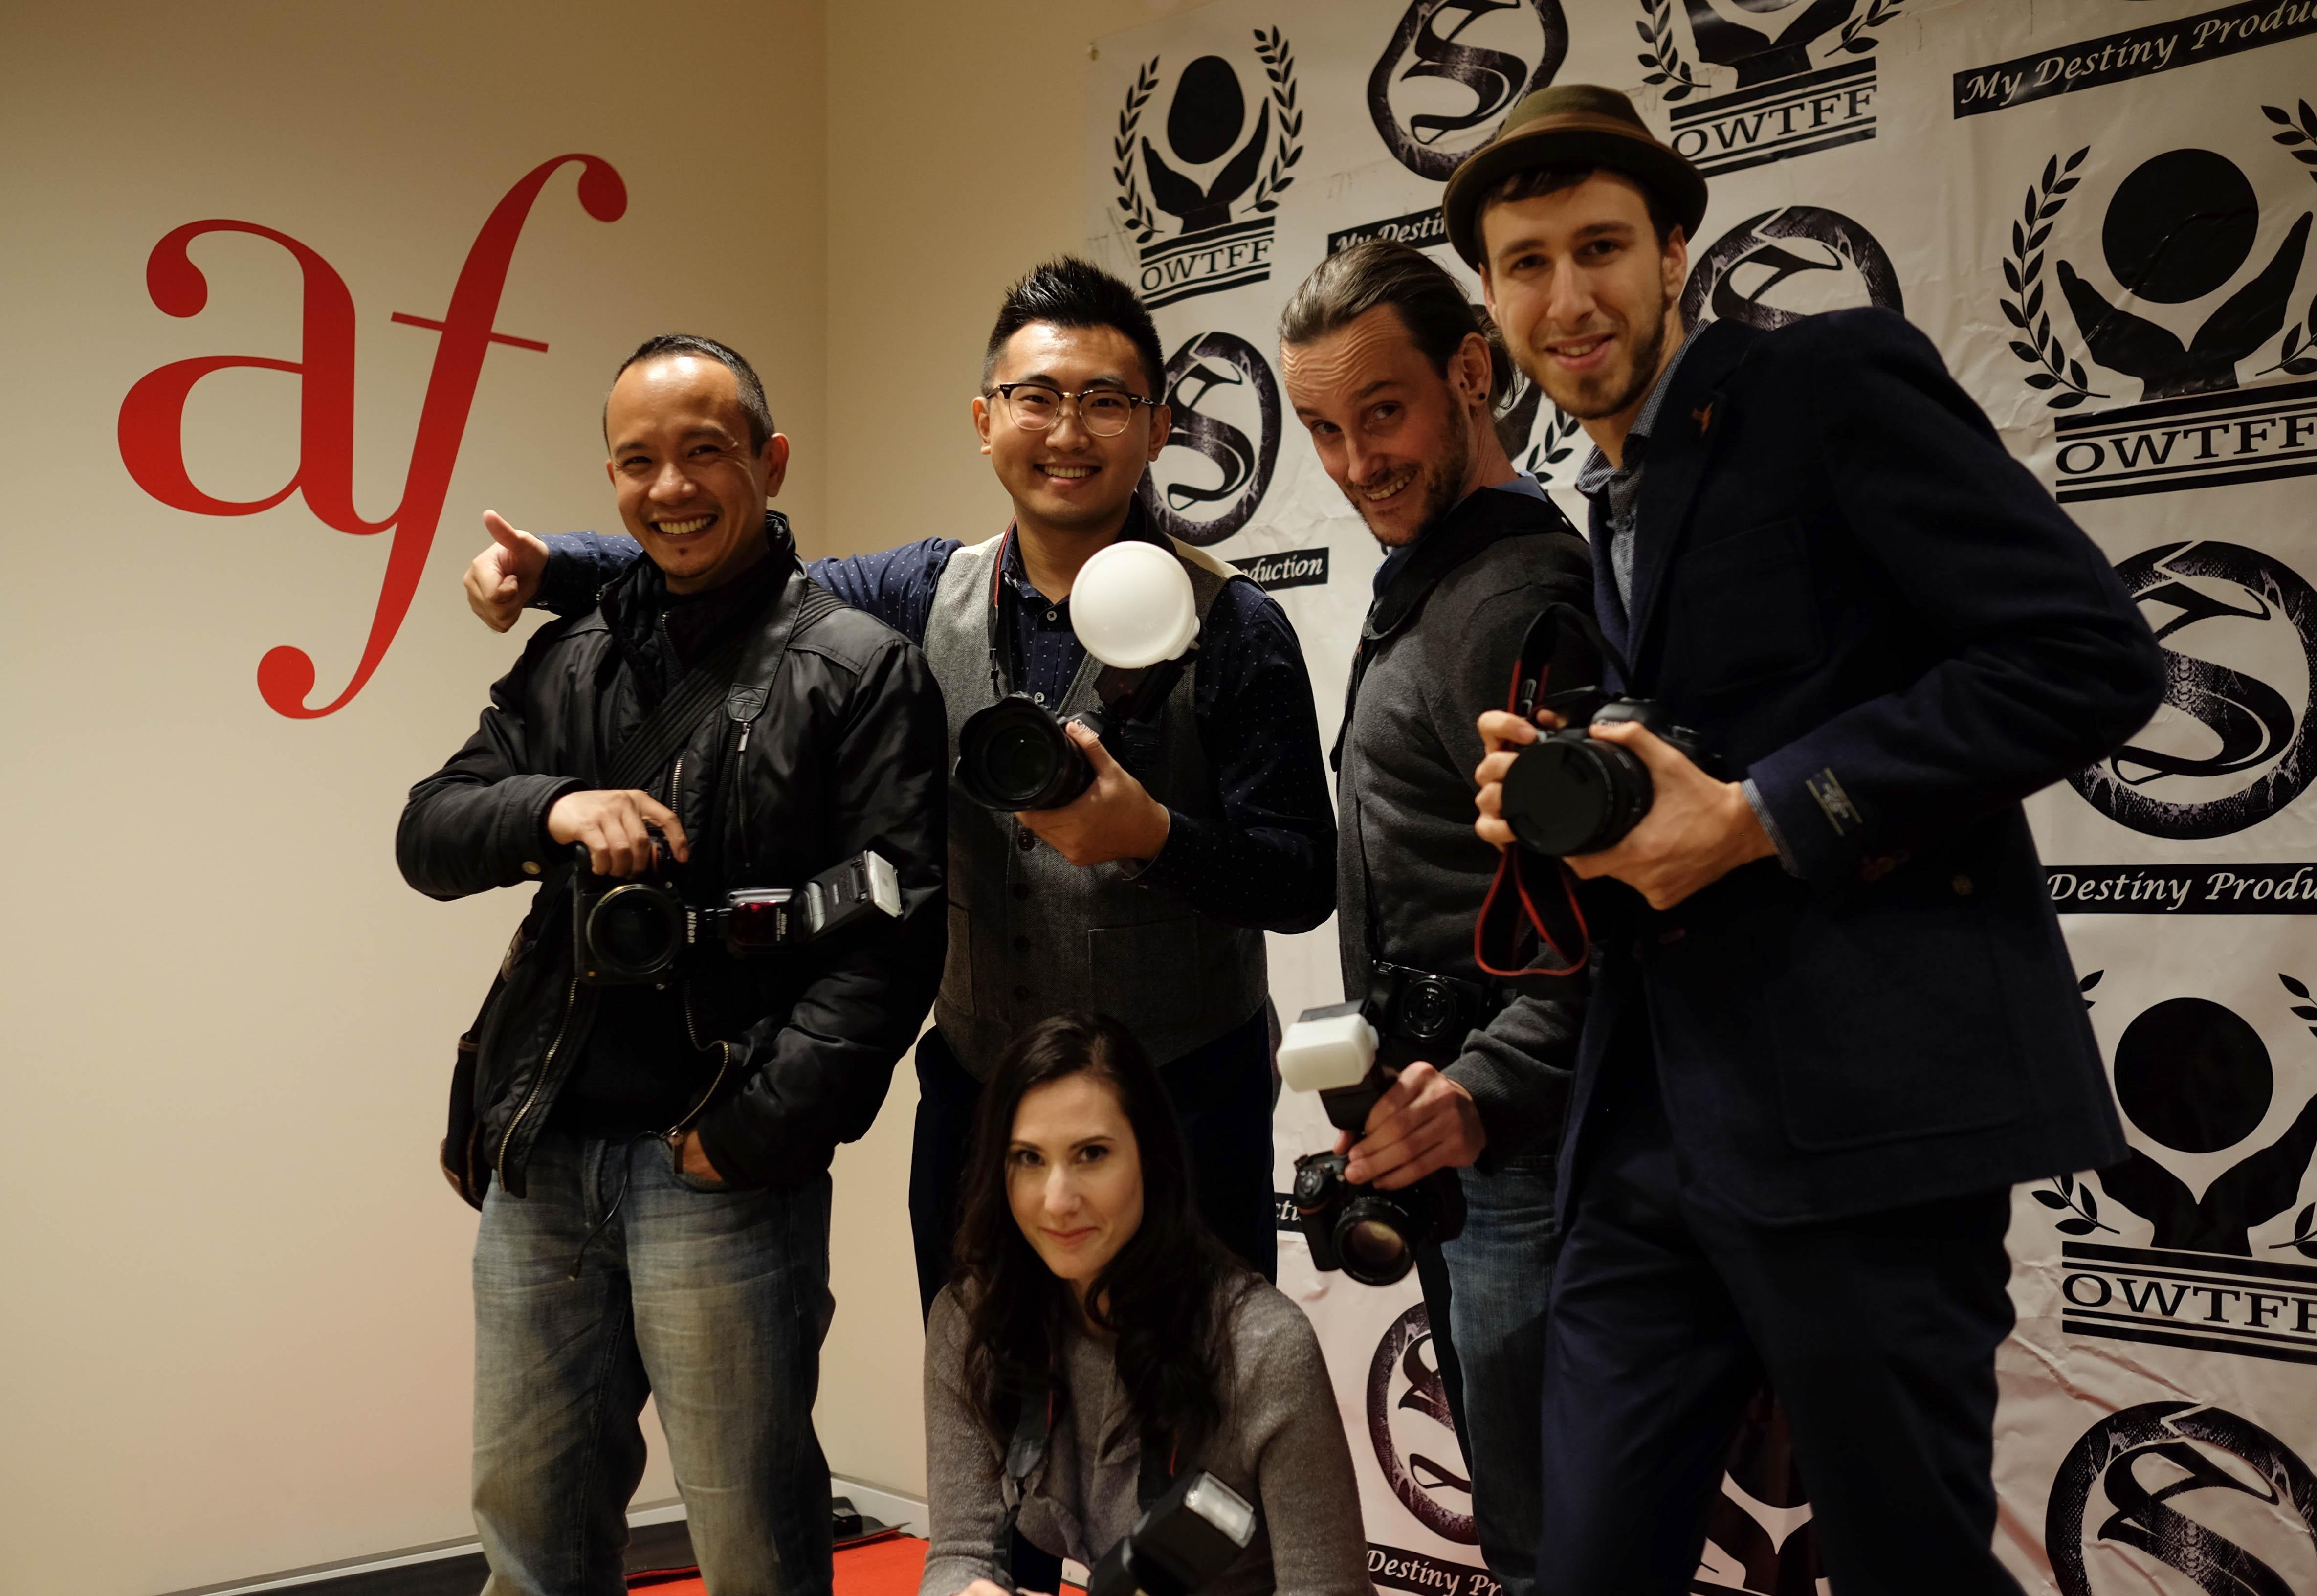 photo-by-katsunori-owtff-2016-red-carpet-awards-and-screenings-event-25